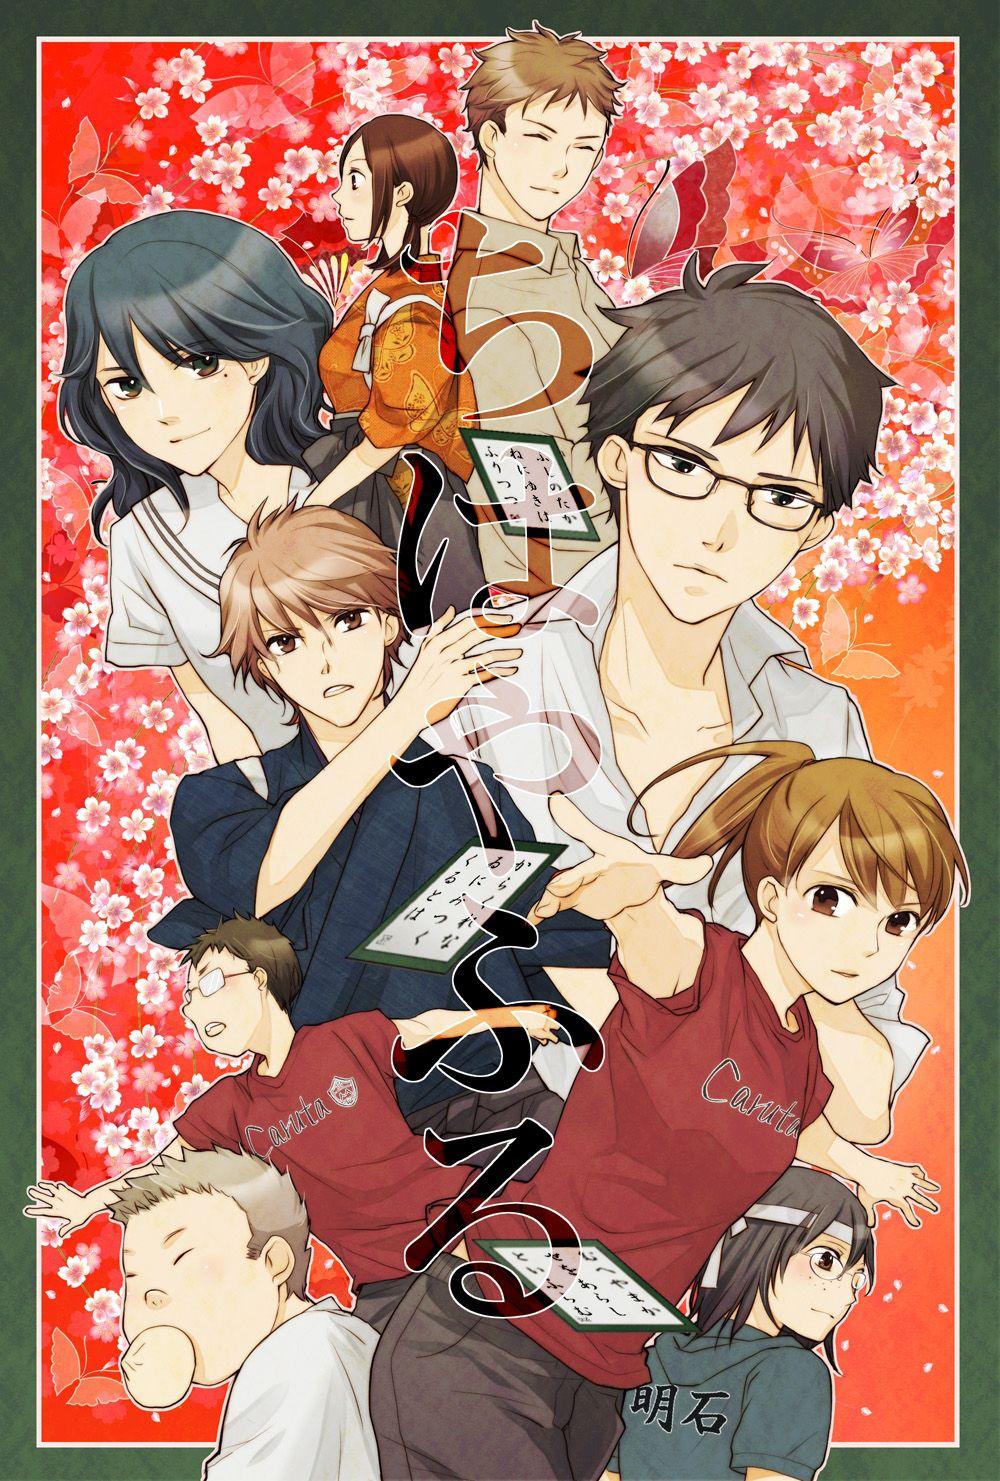 Chihayafuru 1 and 2. This is my goto motivational anime